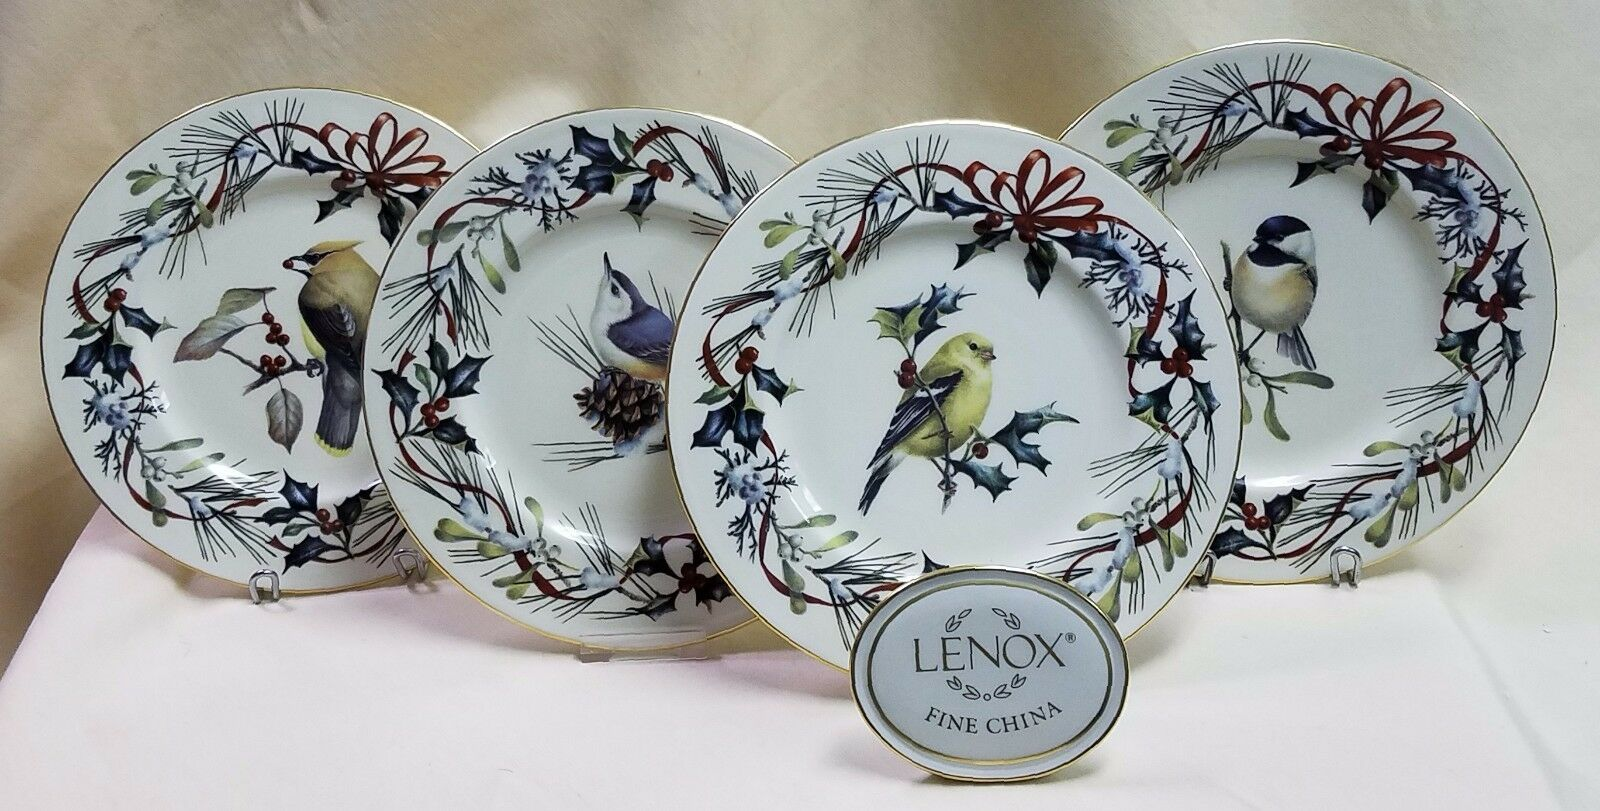 LENOX WINTER GREETINGS Plate Goldfinch, Chickadee, Nuthatch, Or Cedar Waxwing 9  - $59.95